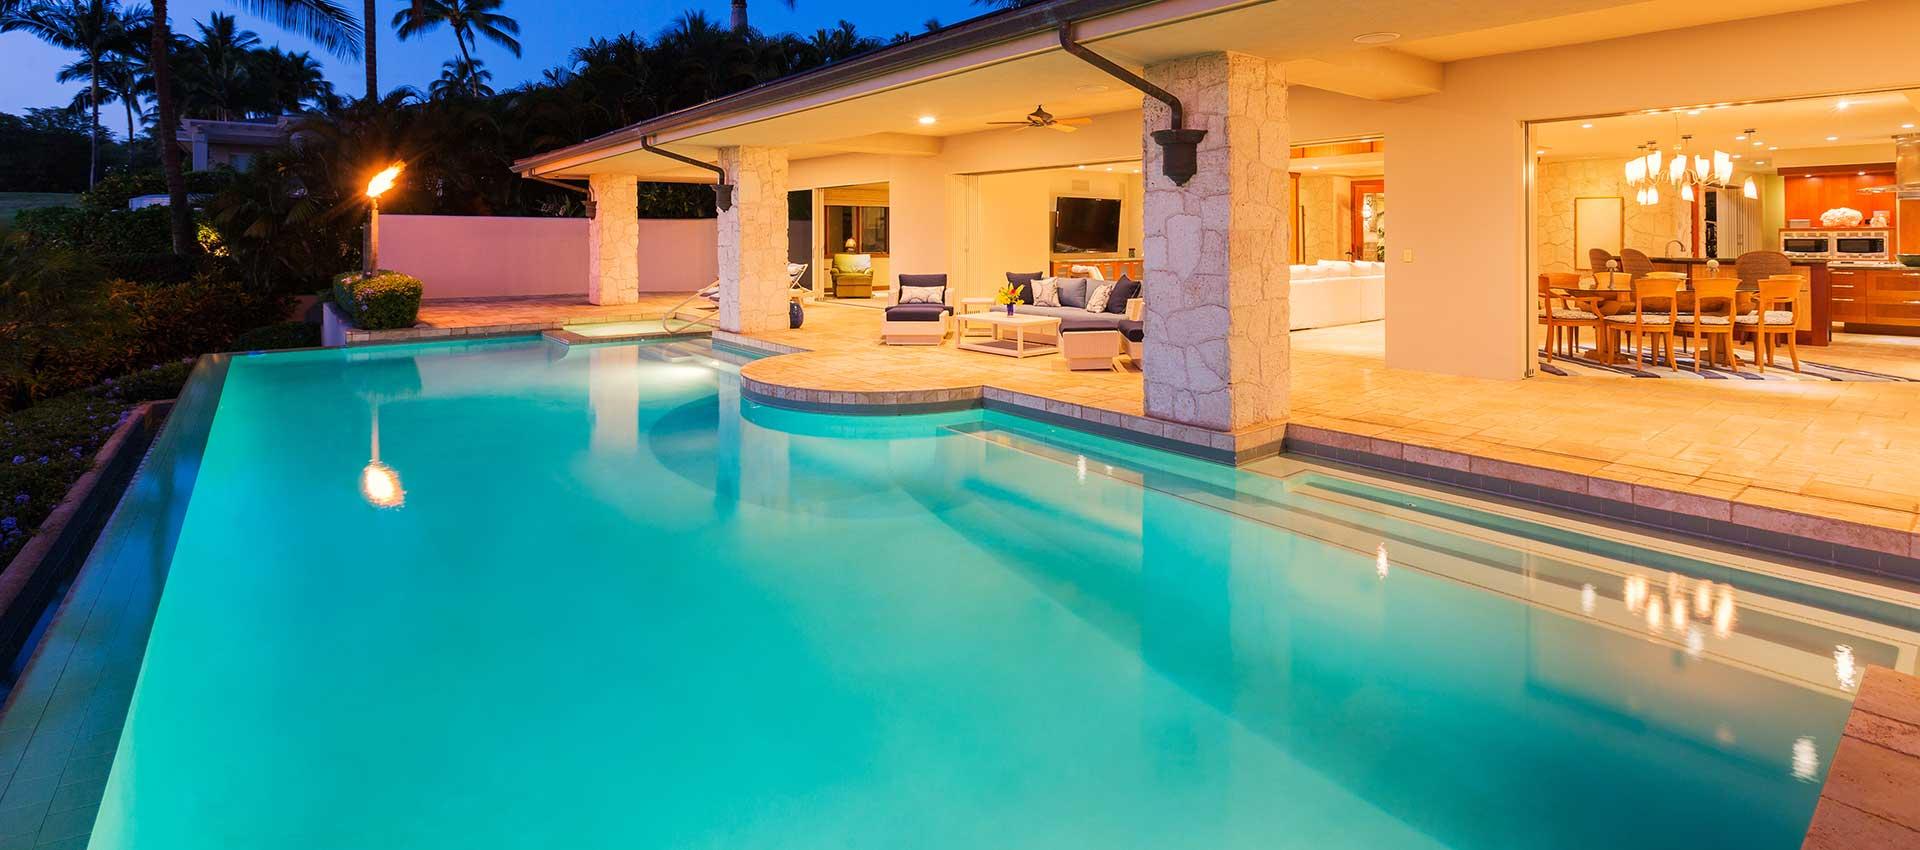 Stay cool in Sundollar Pools